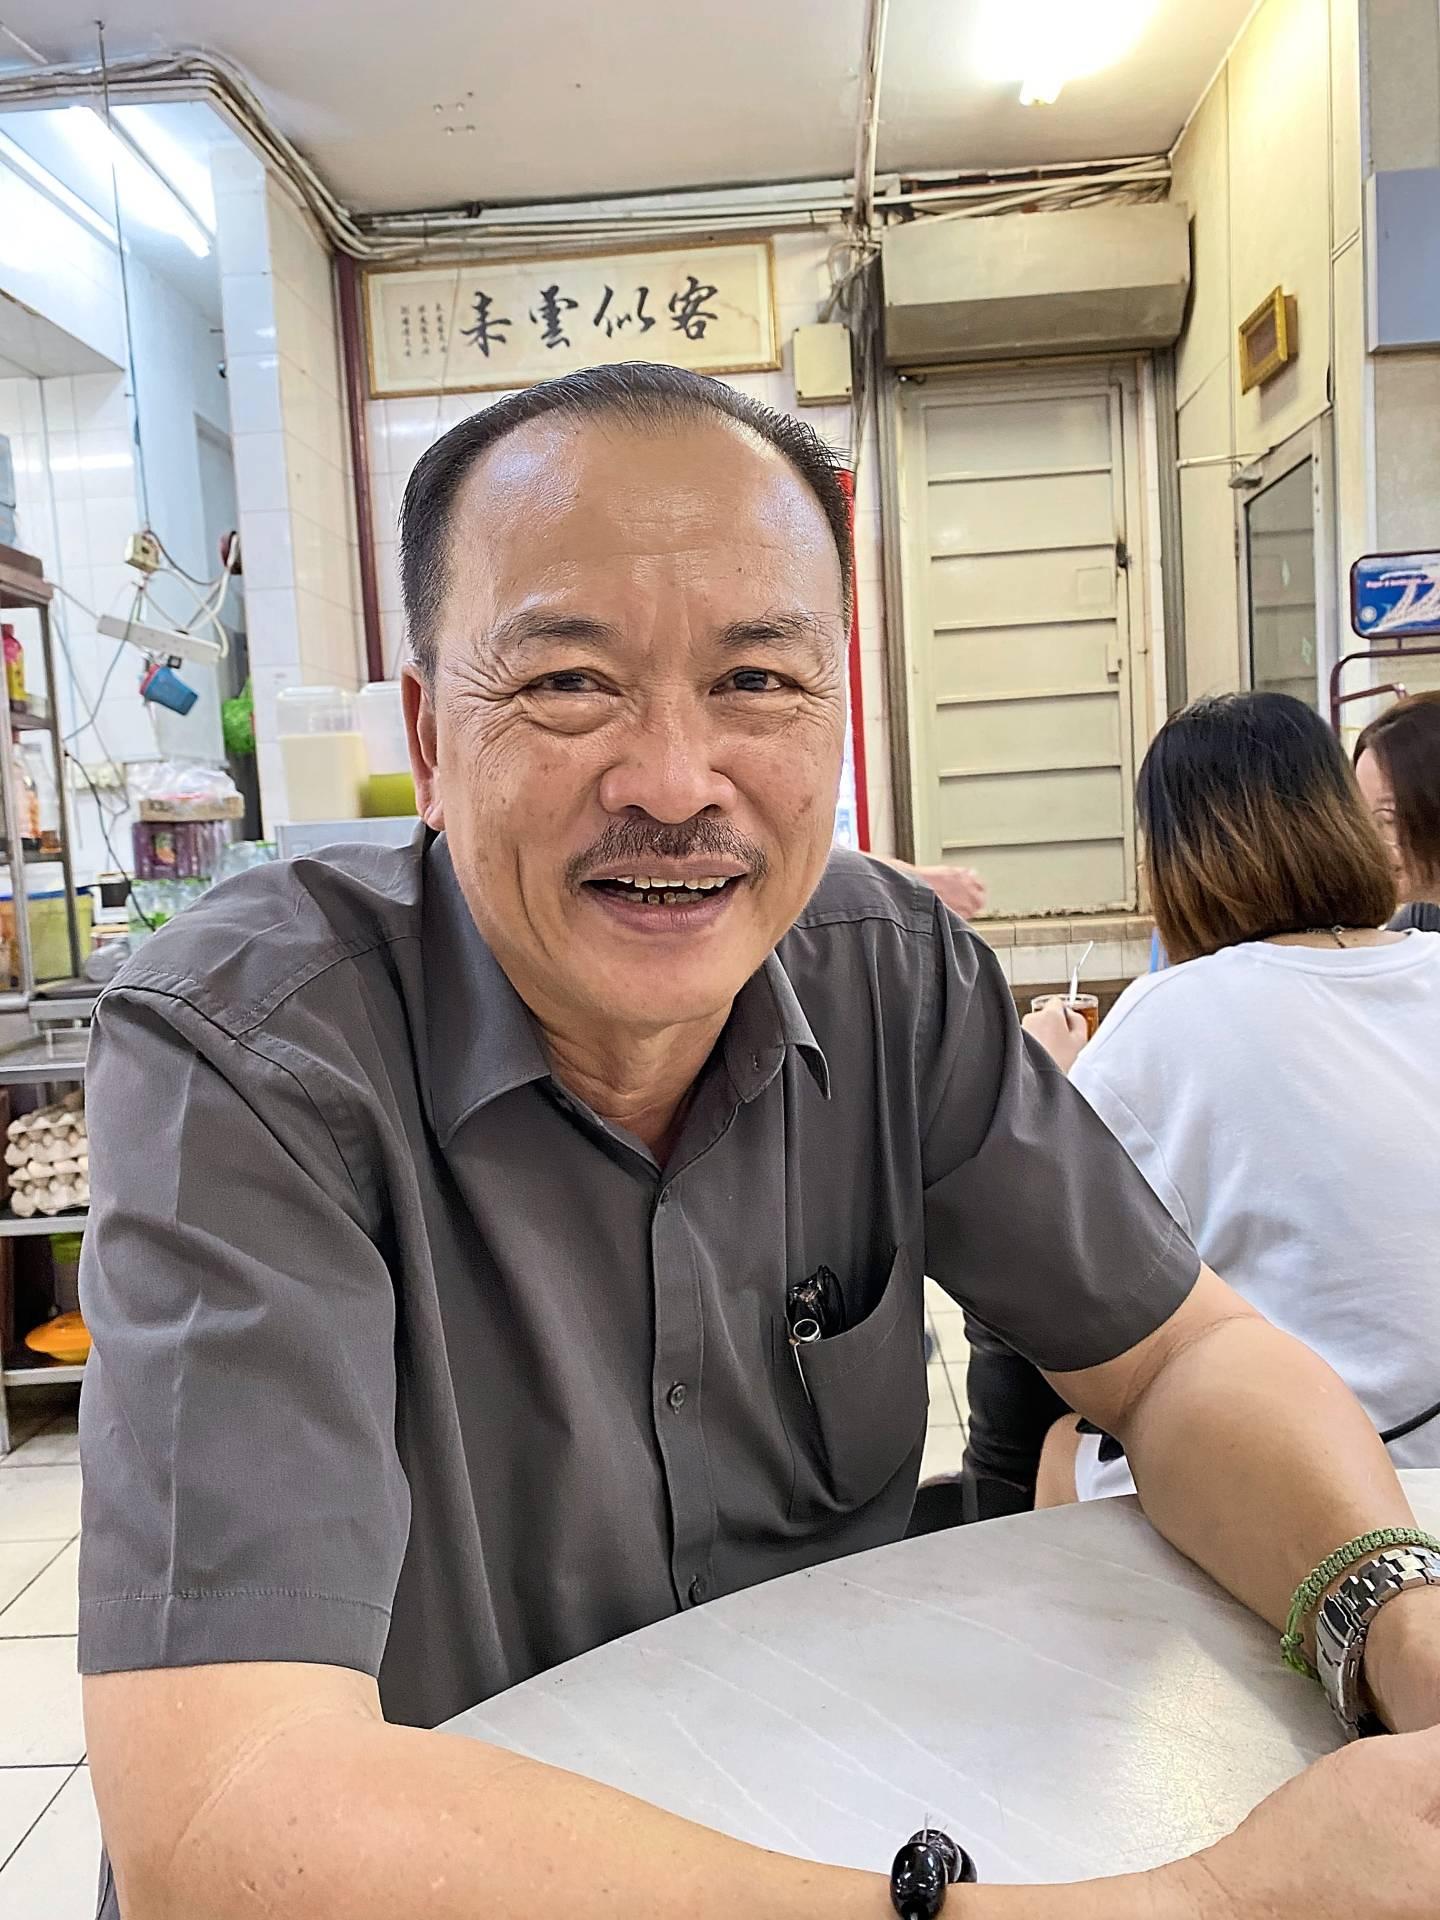 Lee: There should be more enforcement against motorists who double-park along Jalan Sentul.